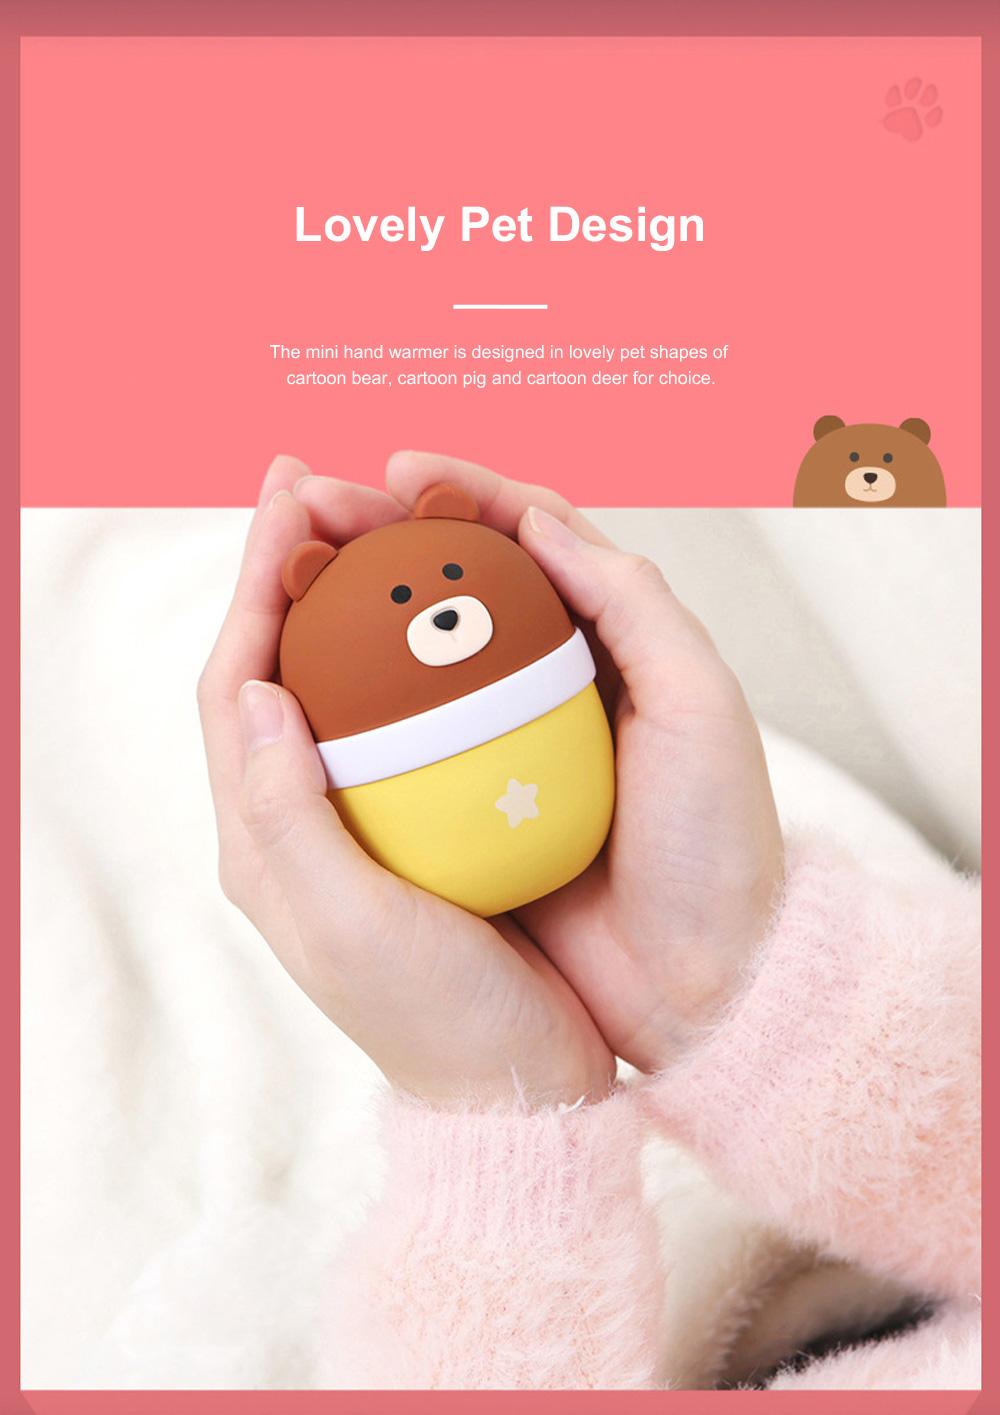 Lovely Pet Hand Warmer Mini Portable Soft Hand Warmer Large Capacity Portable Power Bank Christmas Gift 2